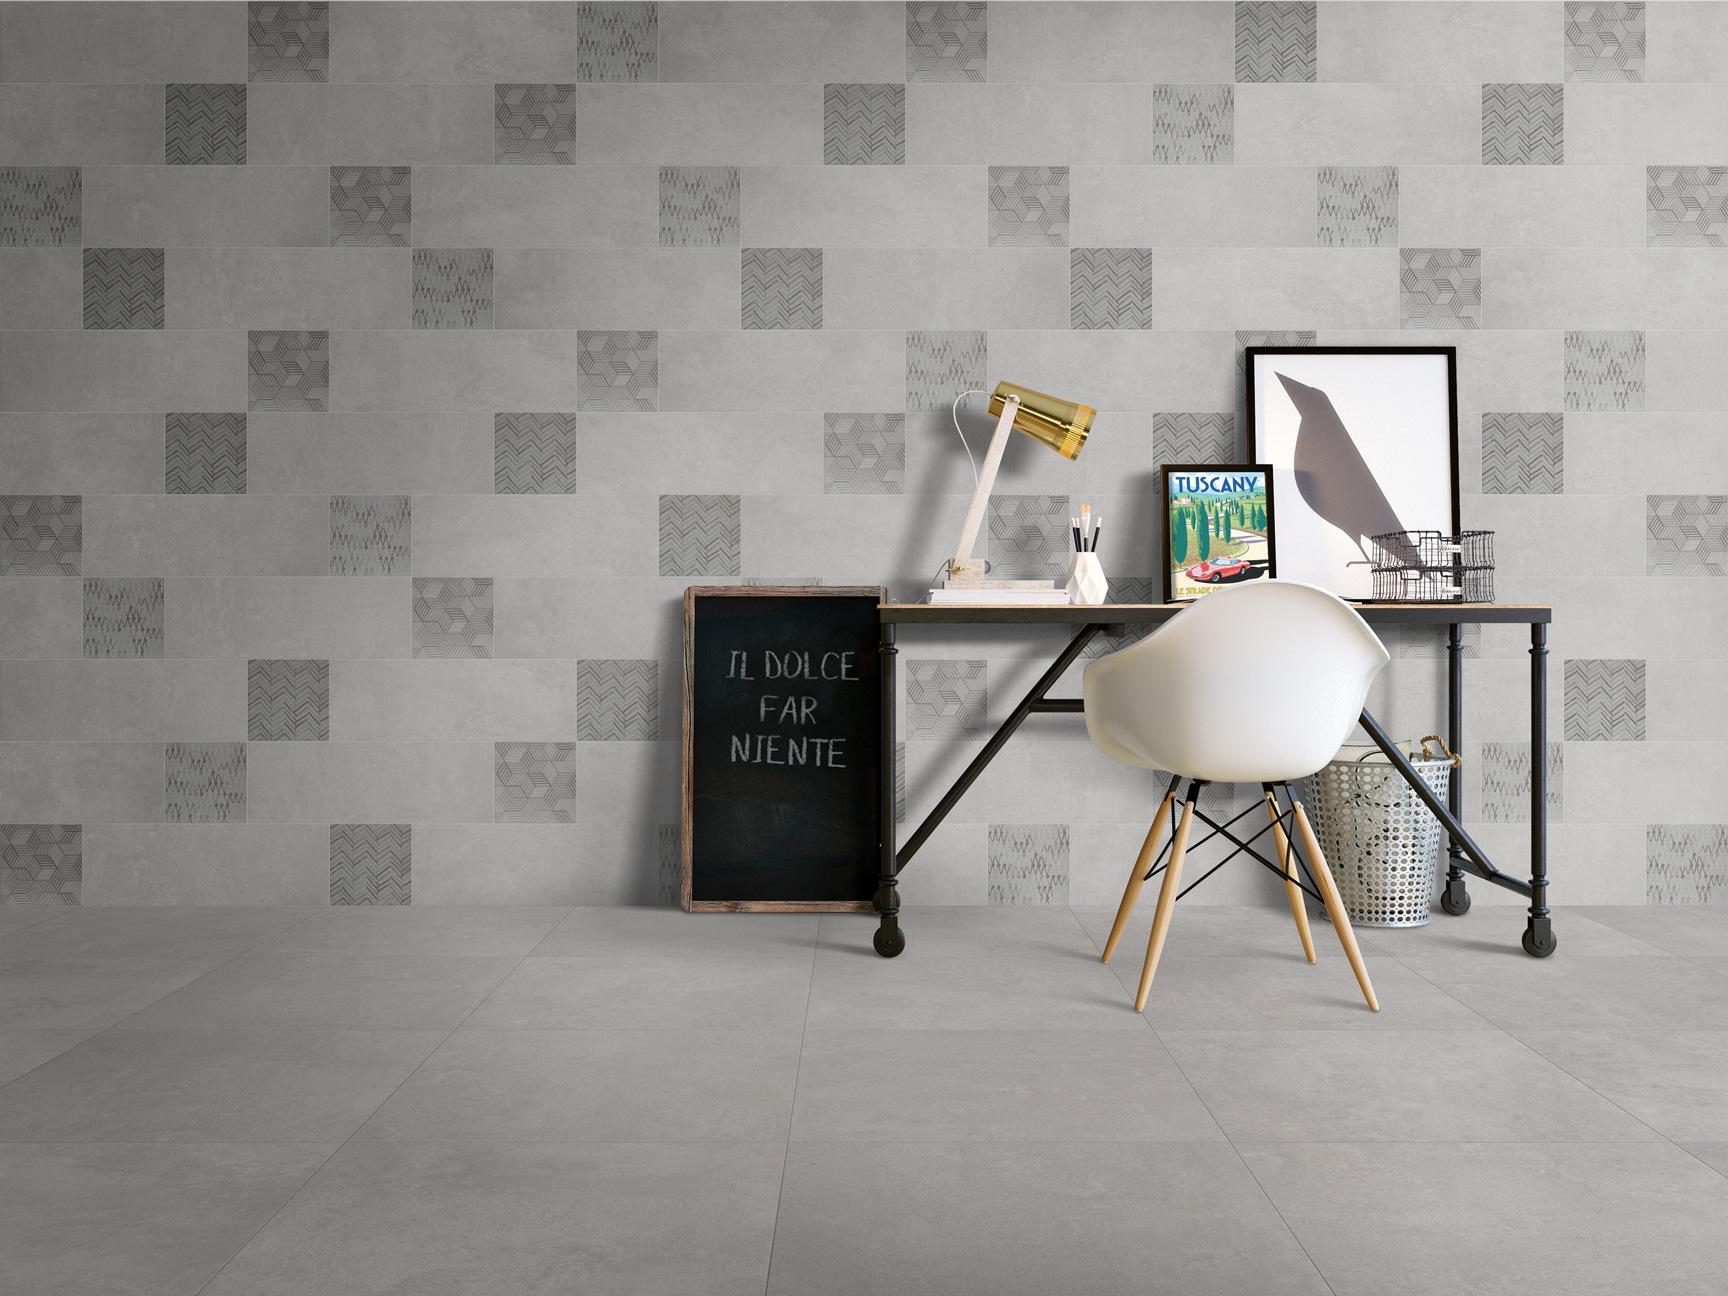 porcelain tile images: Perfetto range high quality photo